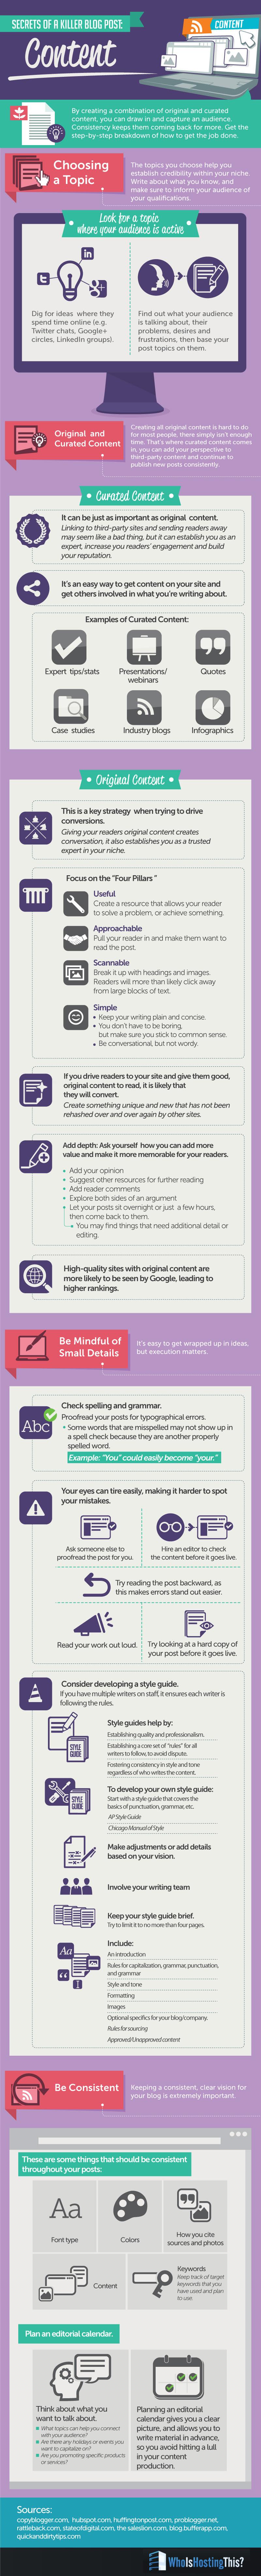 7 secrets of a Killer Blog Post: Content infographic